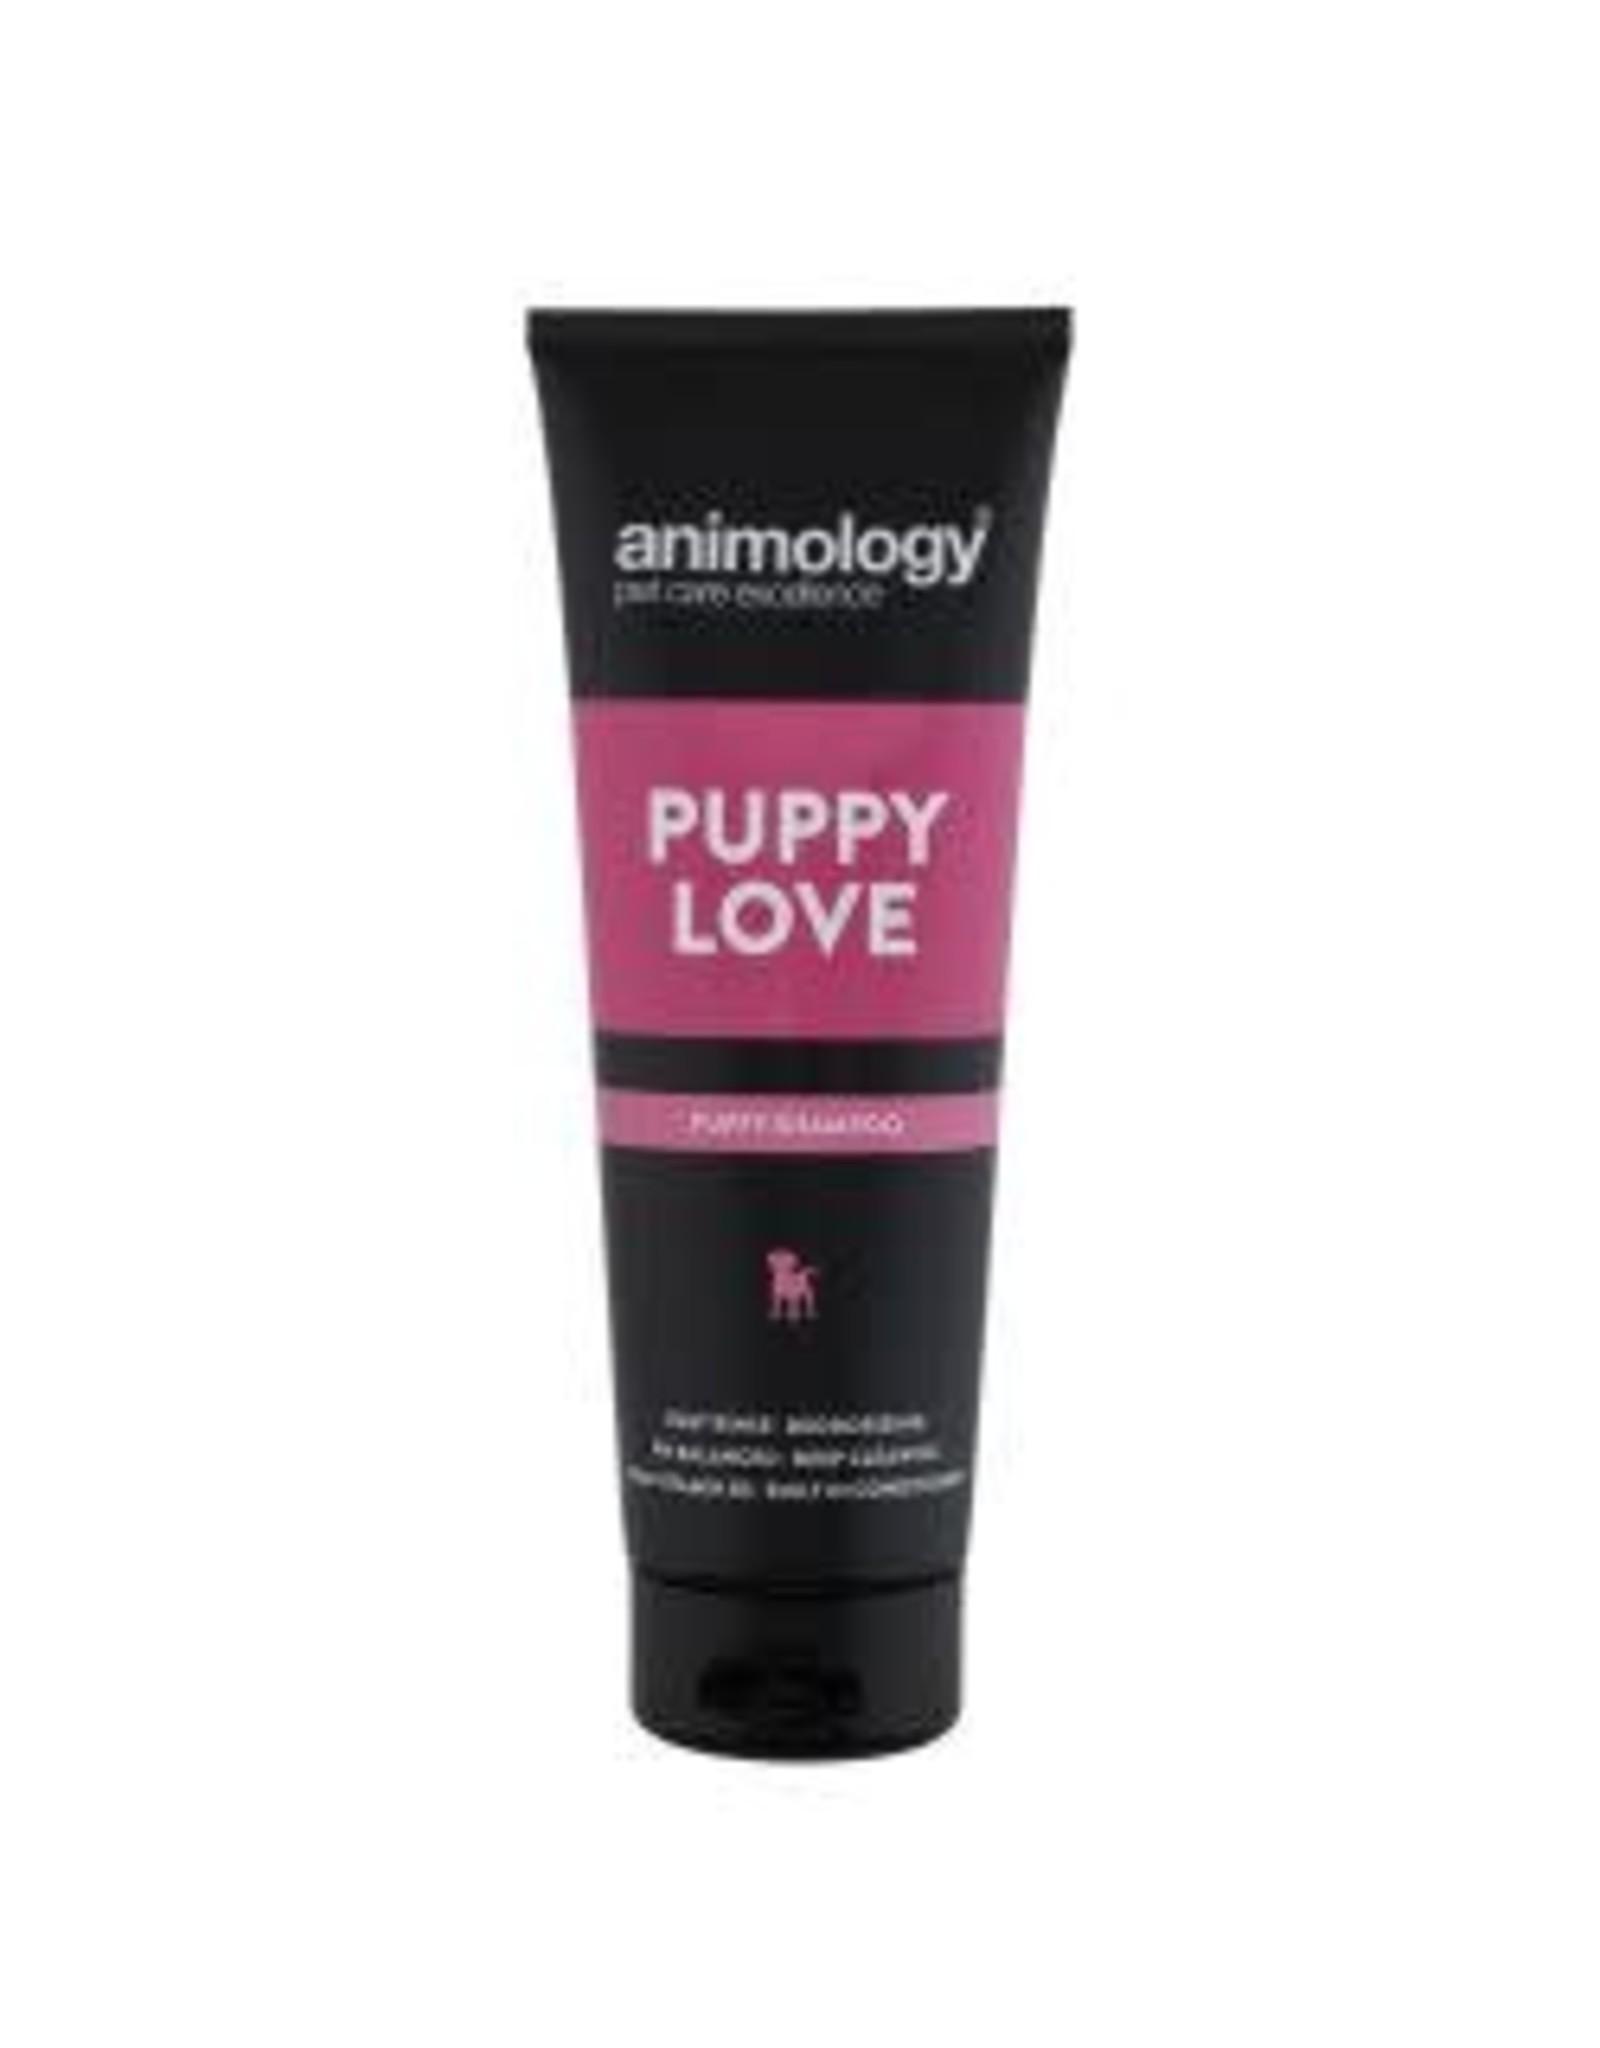 Animology Animology Puppy Love Shampoo 250ml